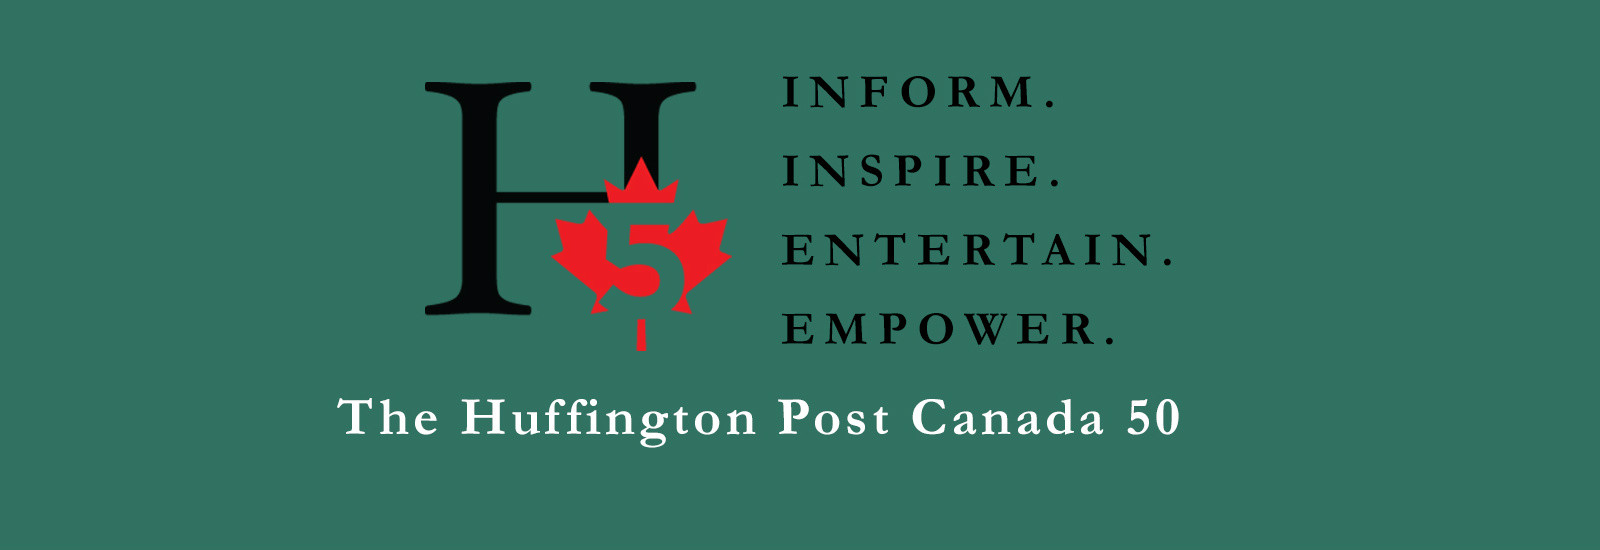 2016 Huffington Post Canada 50